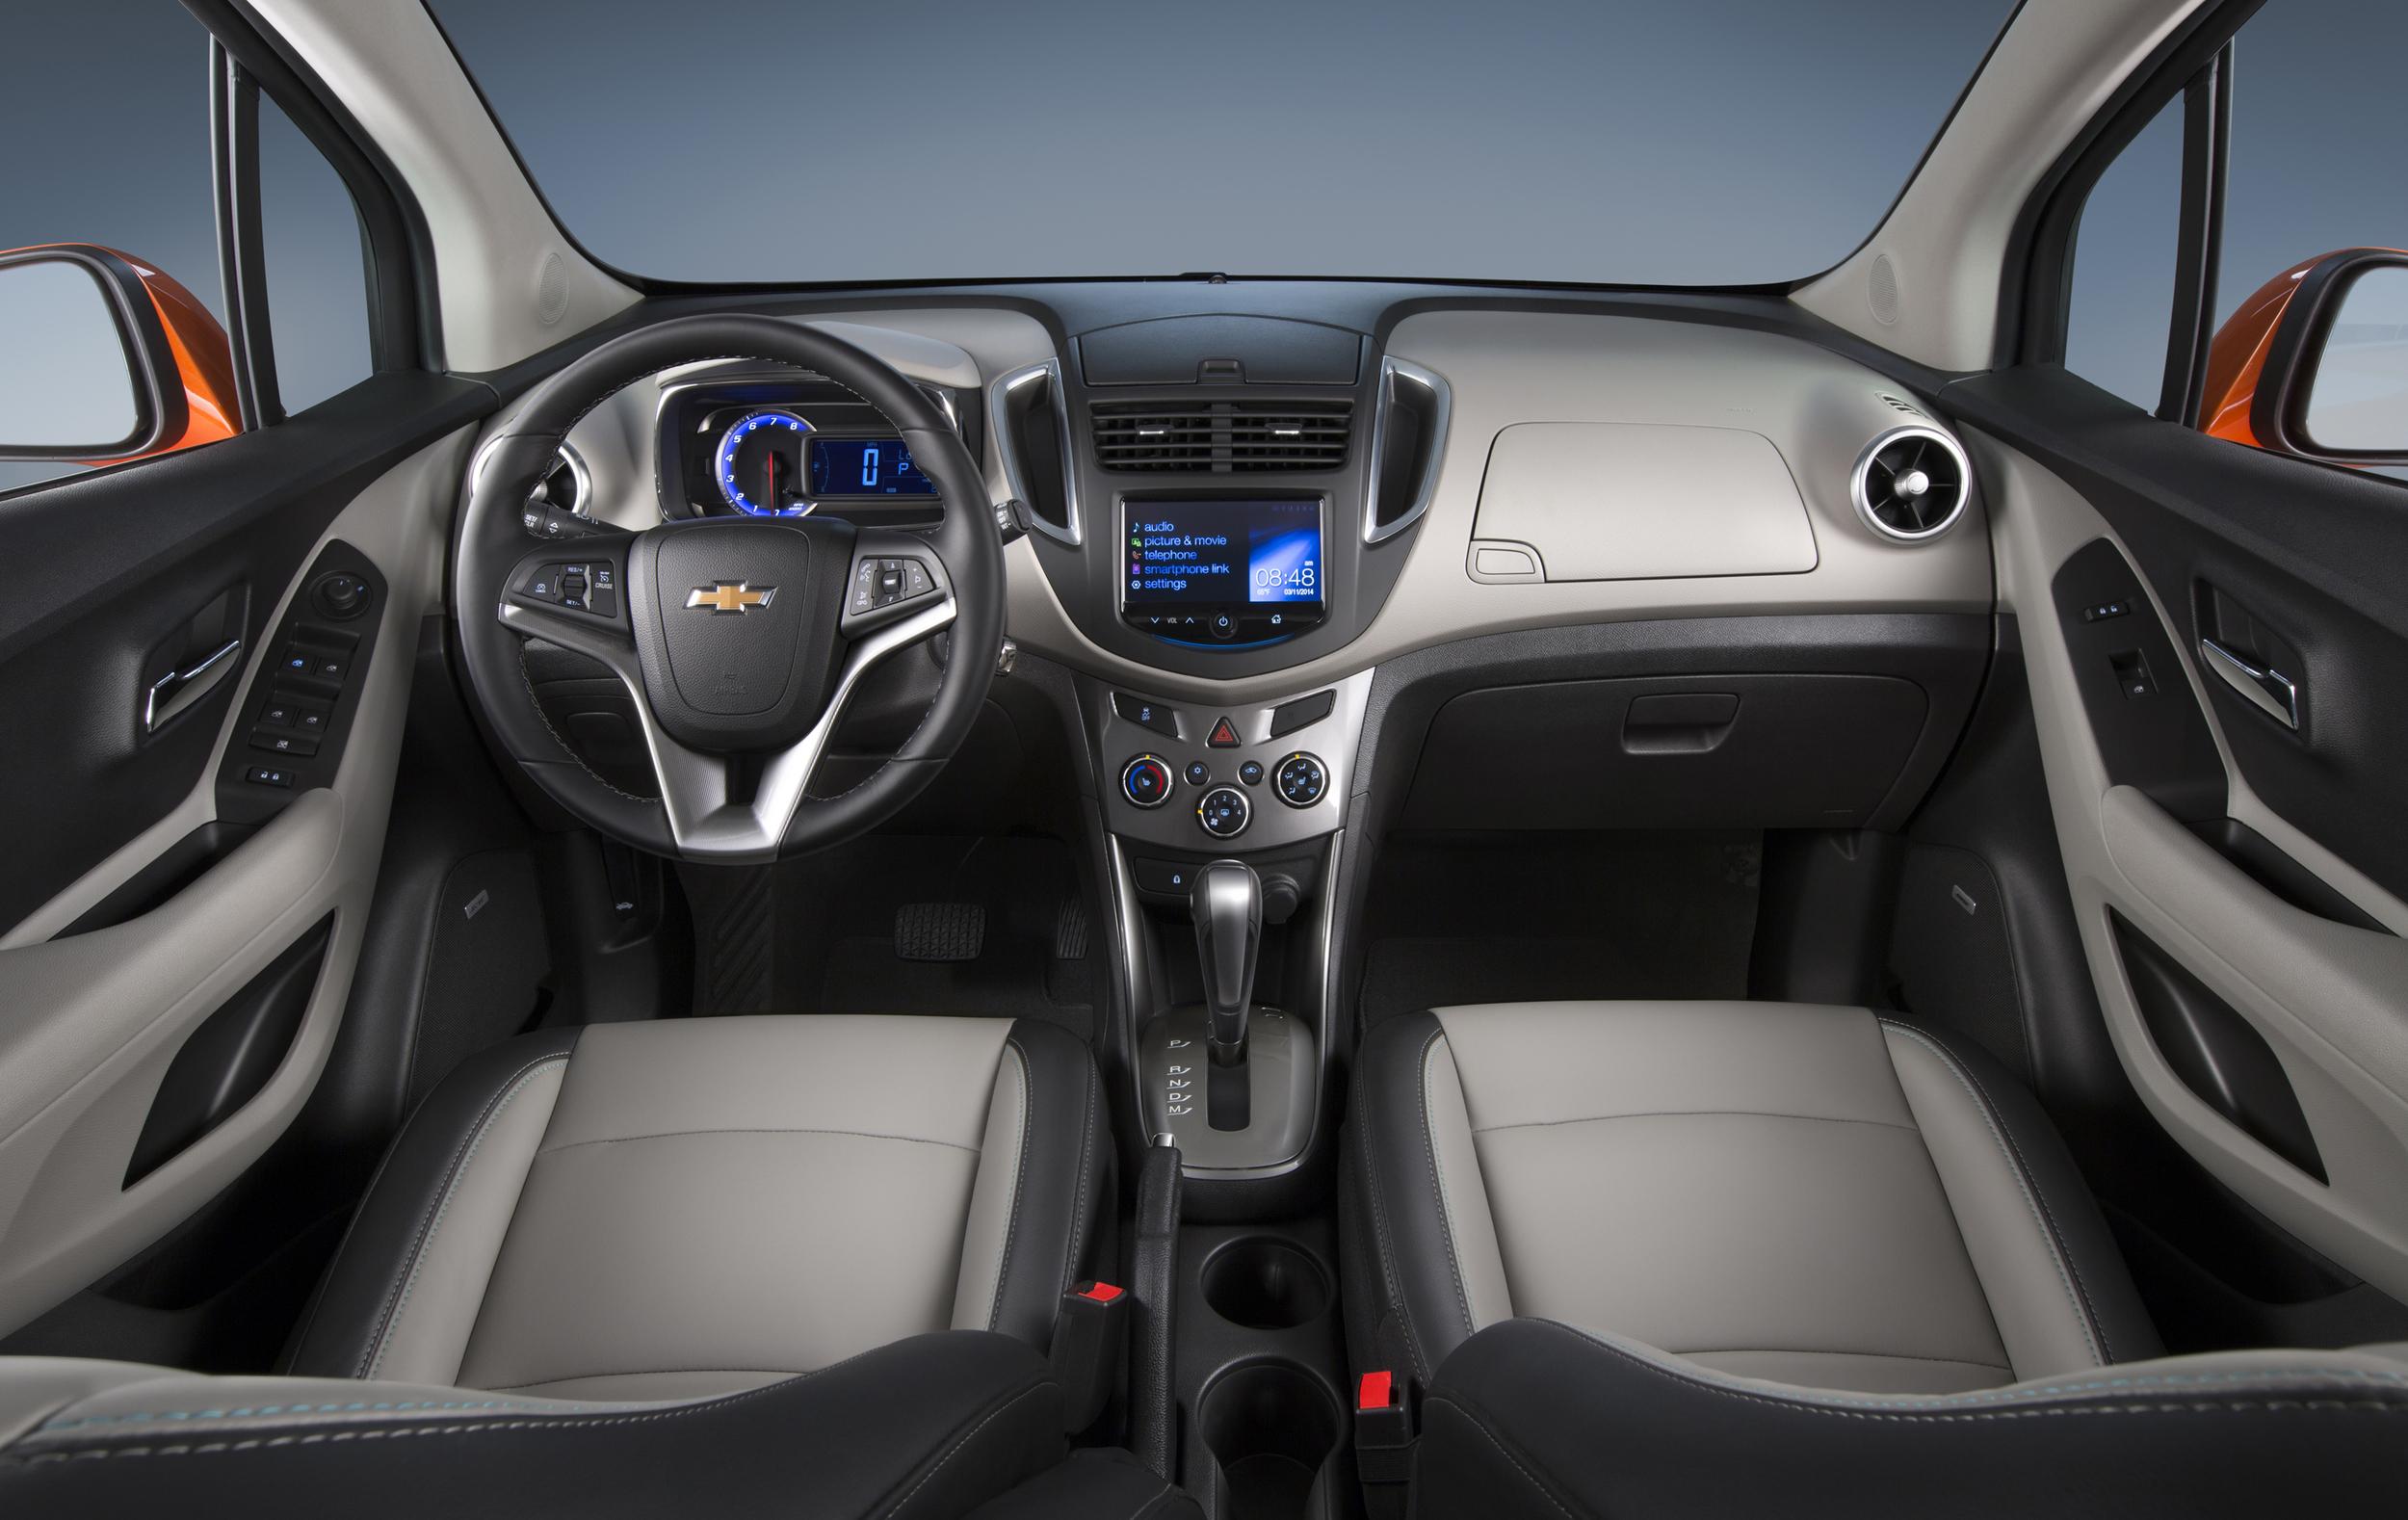 2016-Chevrolet-Trax-005.jpg